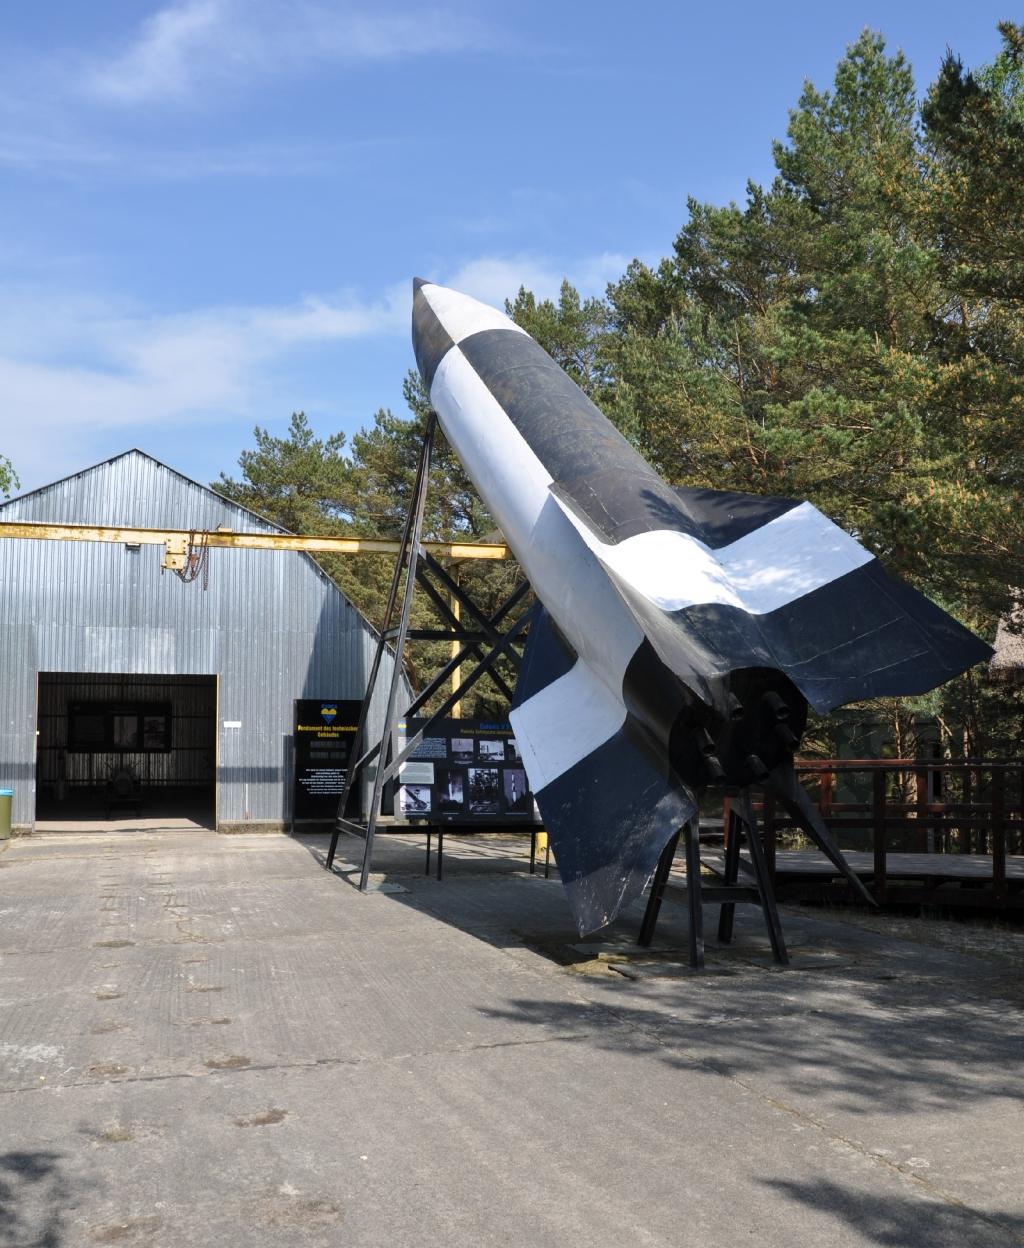 poland-leba-wyrzutnia-rakiet